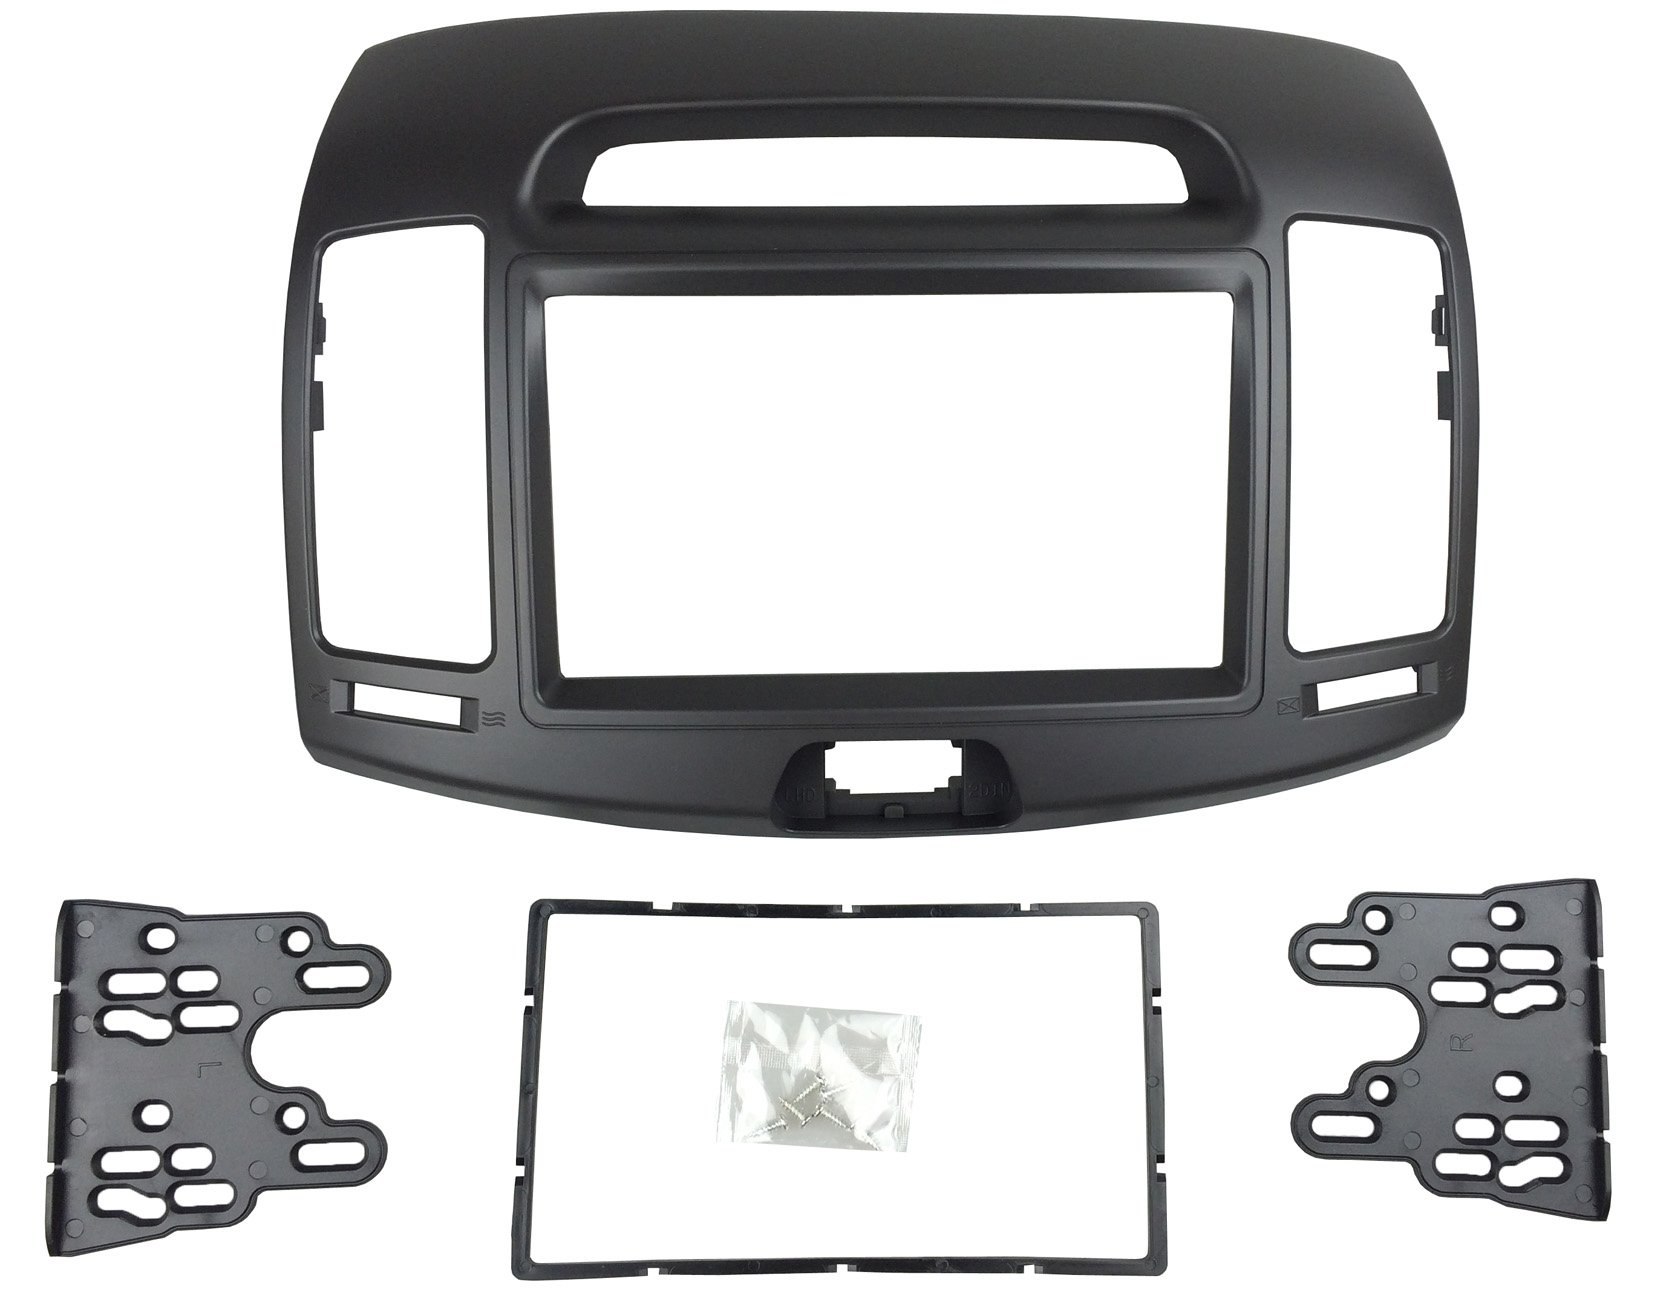 DKMUS Car Stereo Dash Radio Fascia Kit For 2006-2010 Hyundai Elantra (HD), Avante (HD) 2006-2010 Installation Trim Panel Frame Double Din (Black) by DKMUS